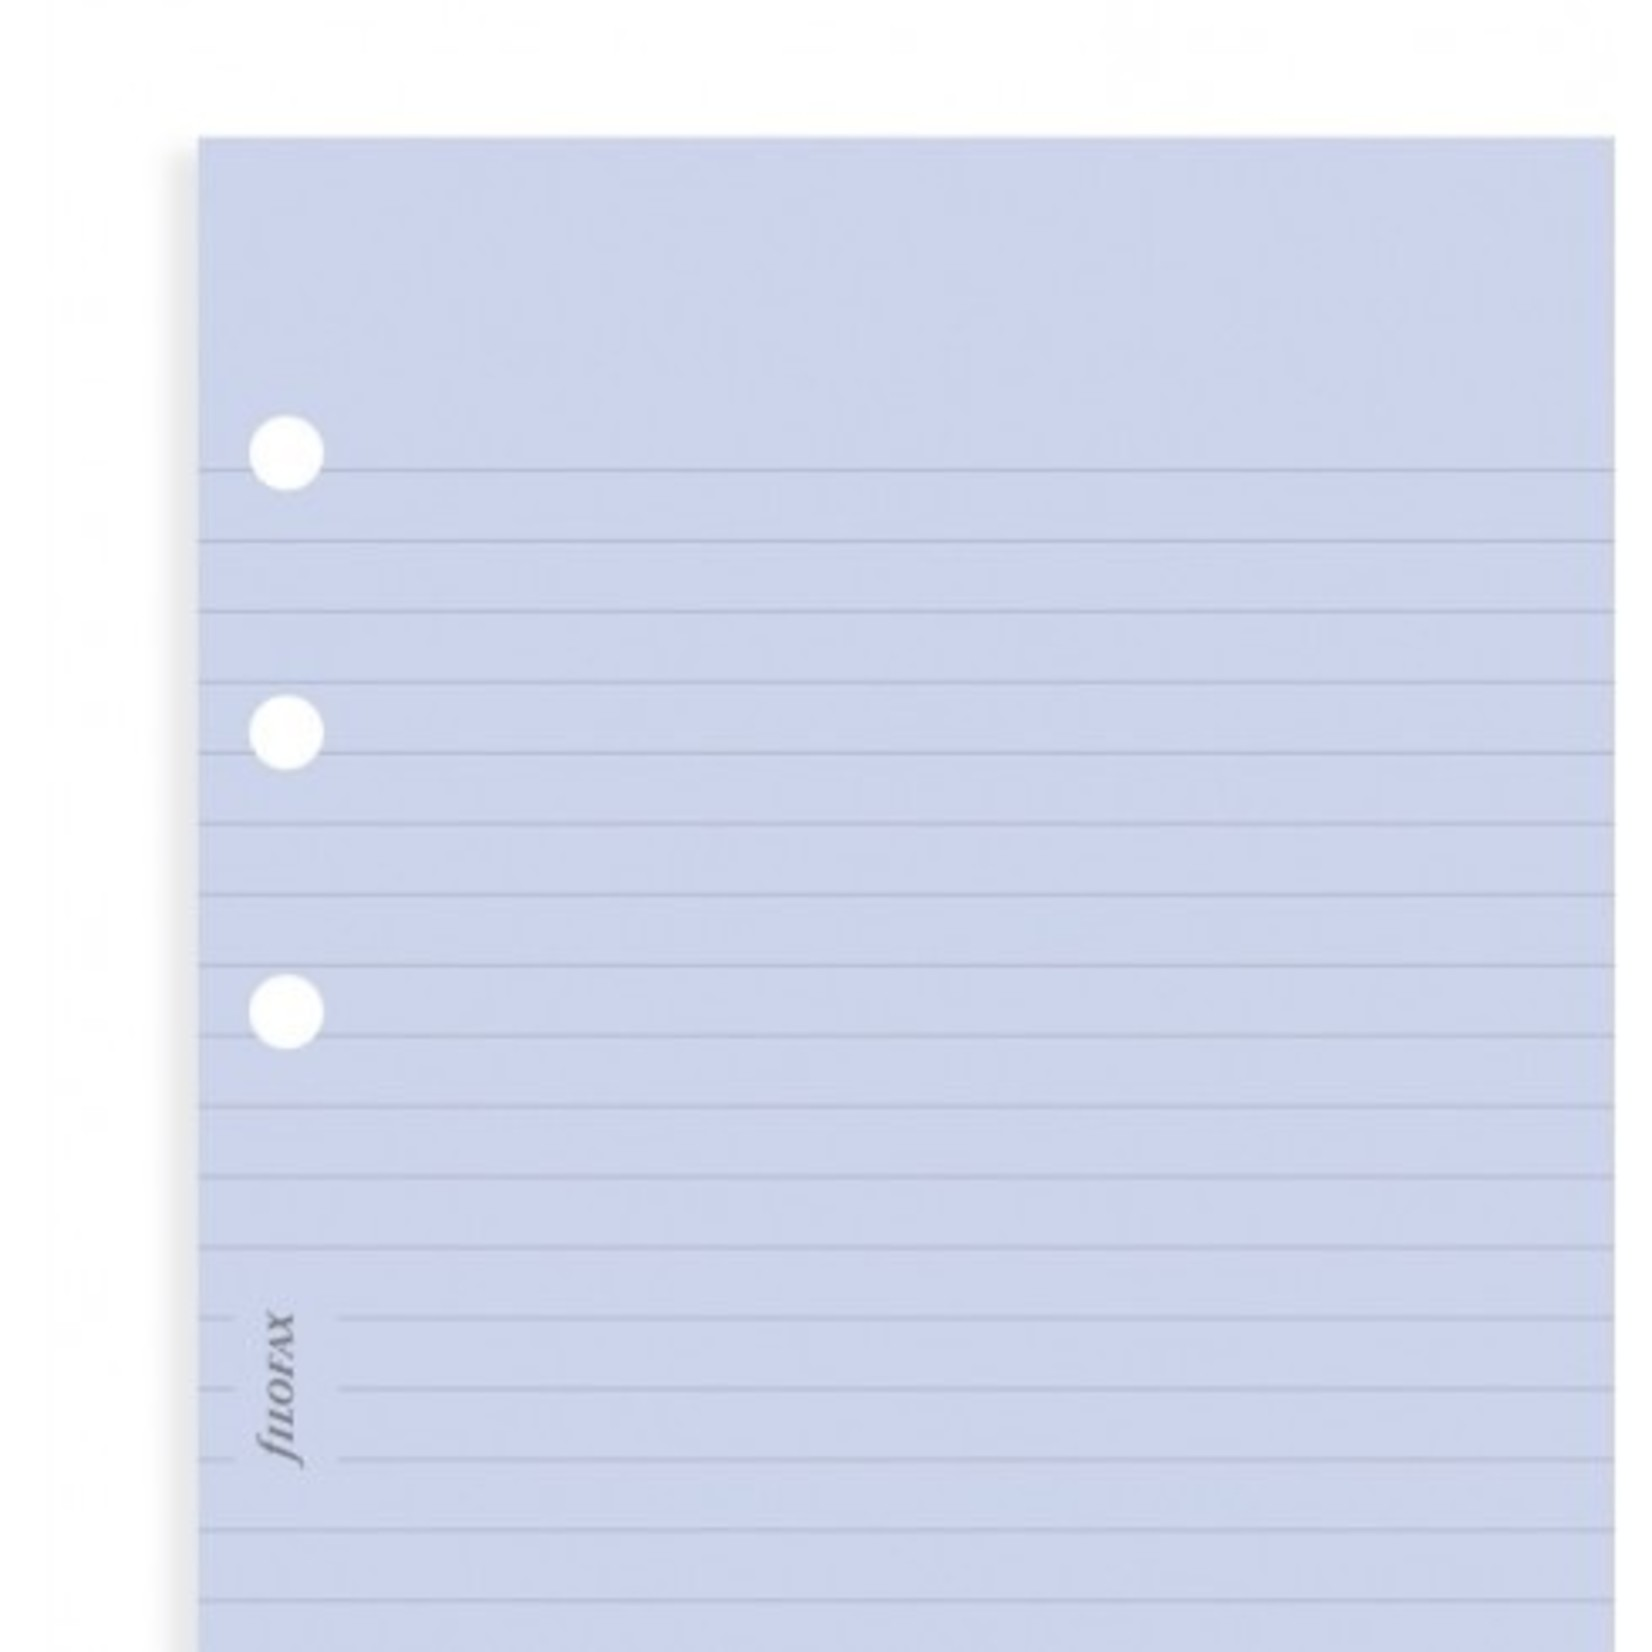 Filofax Filofax Einlage Personal, Papier liniert, blau